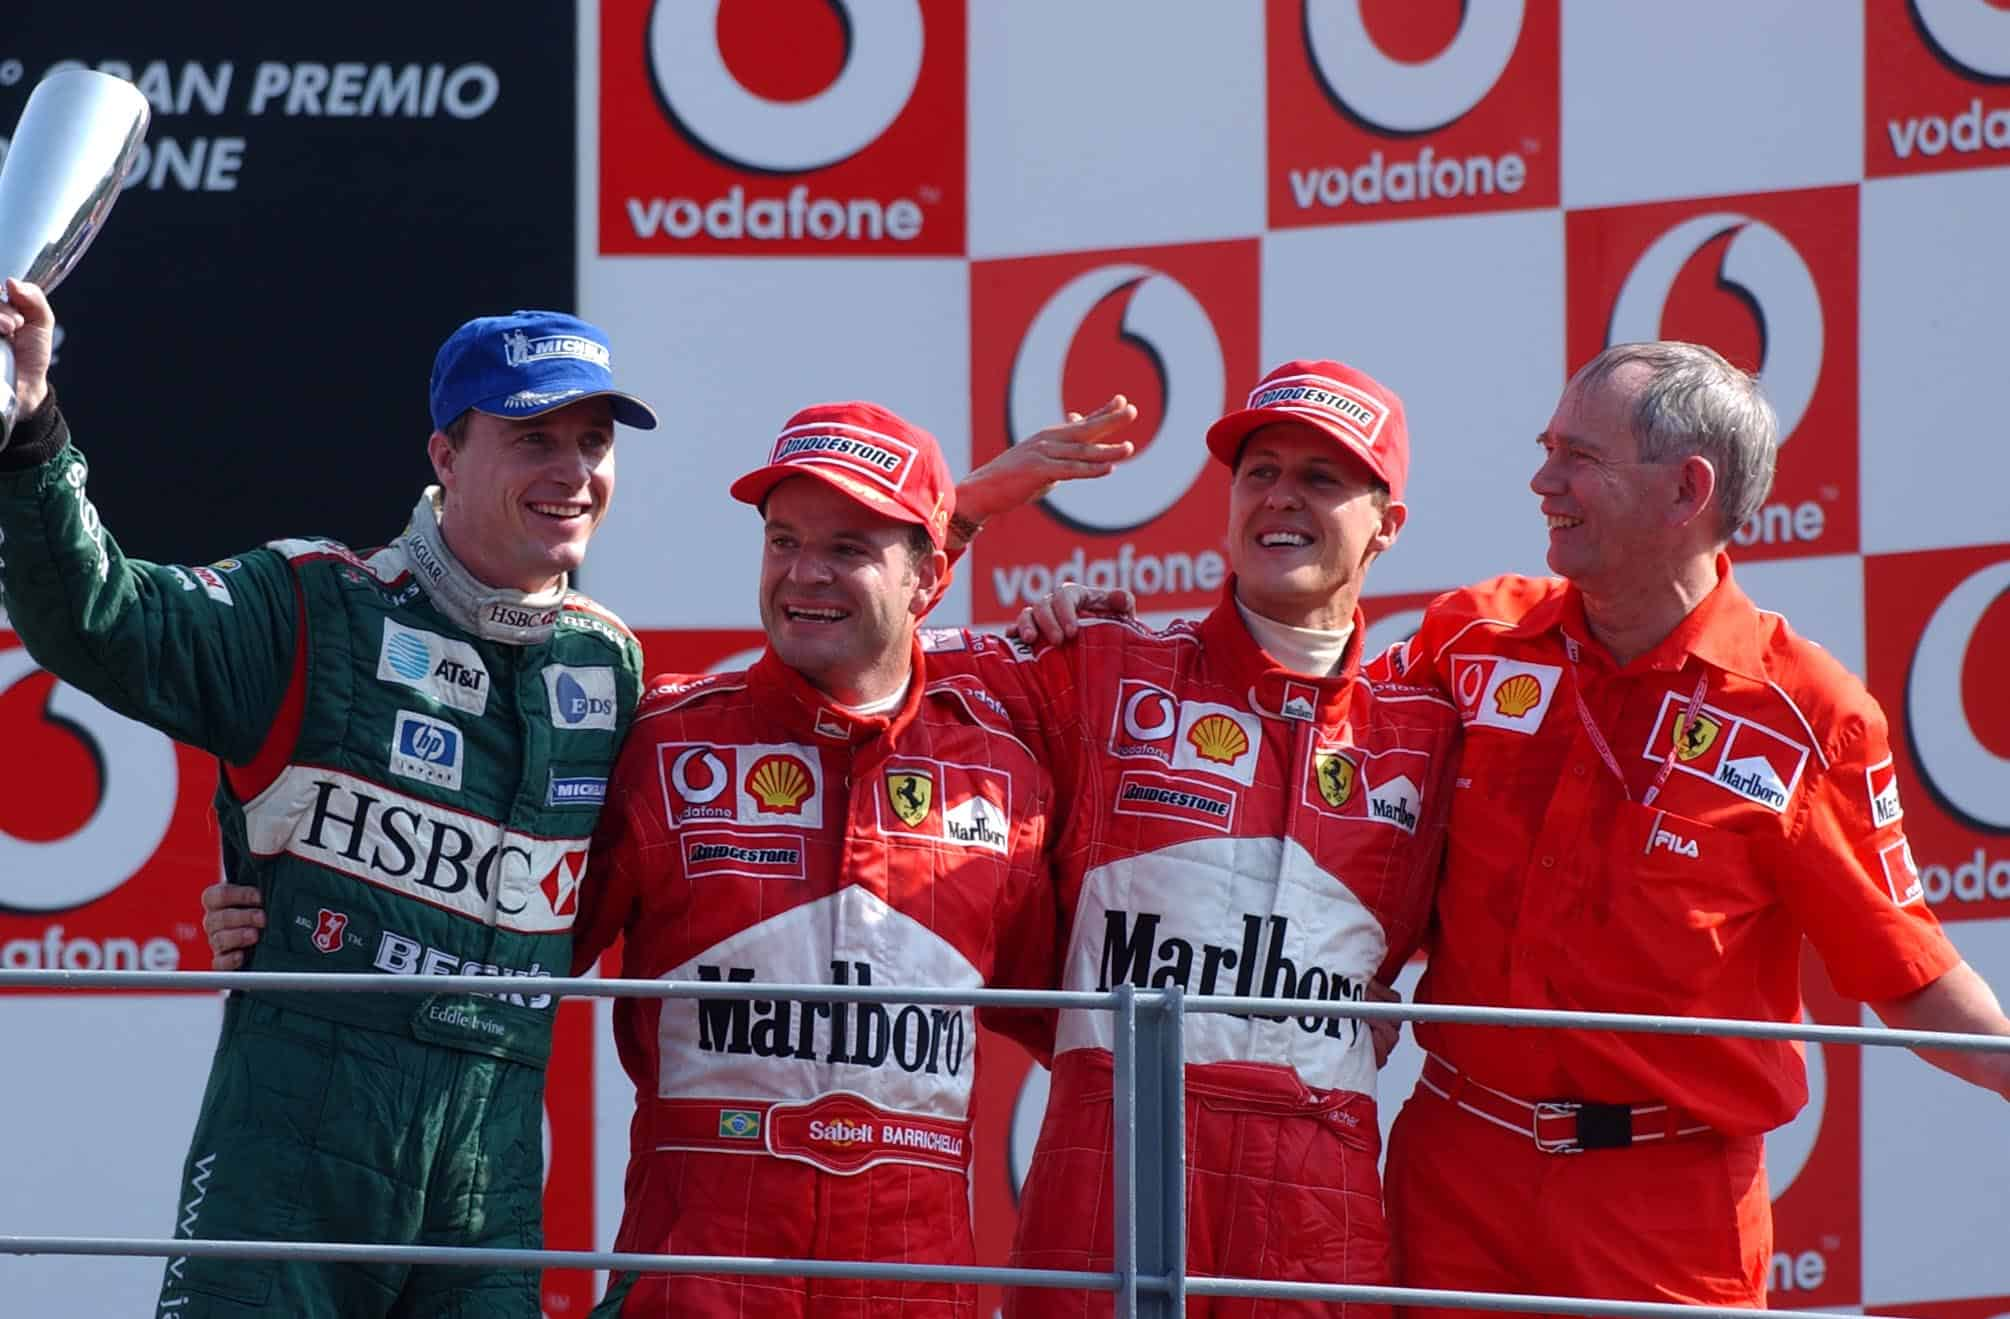 Italian GP F1 2002 Monza podium Photo Ferrari